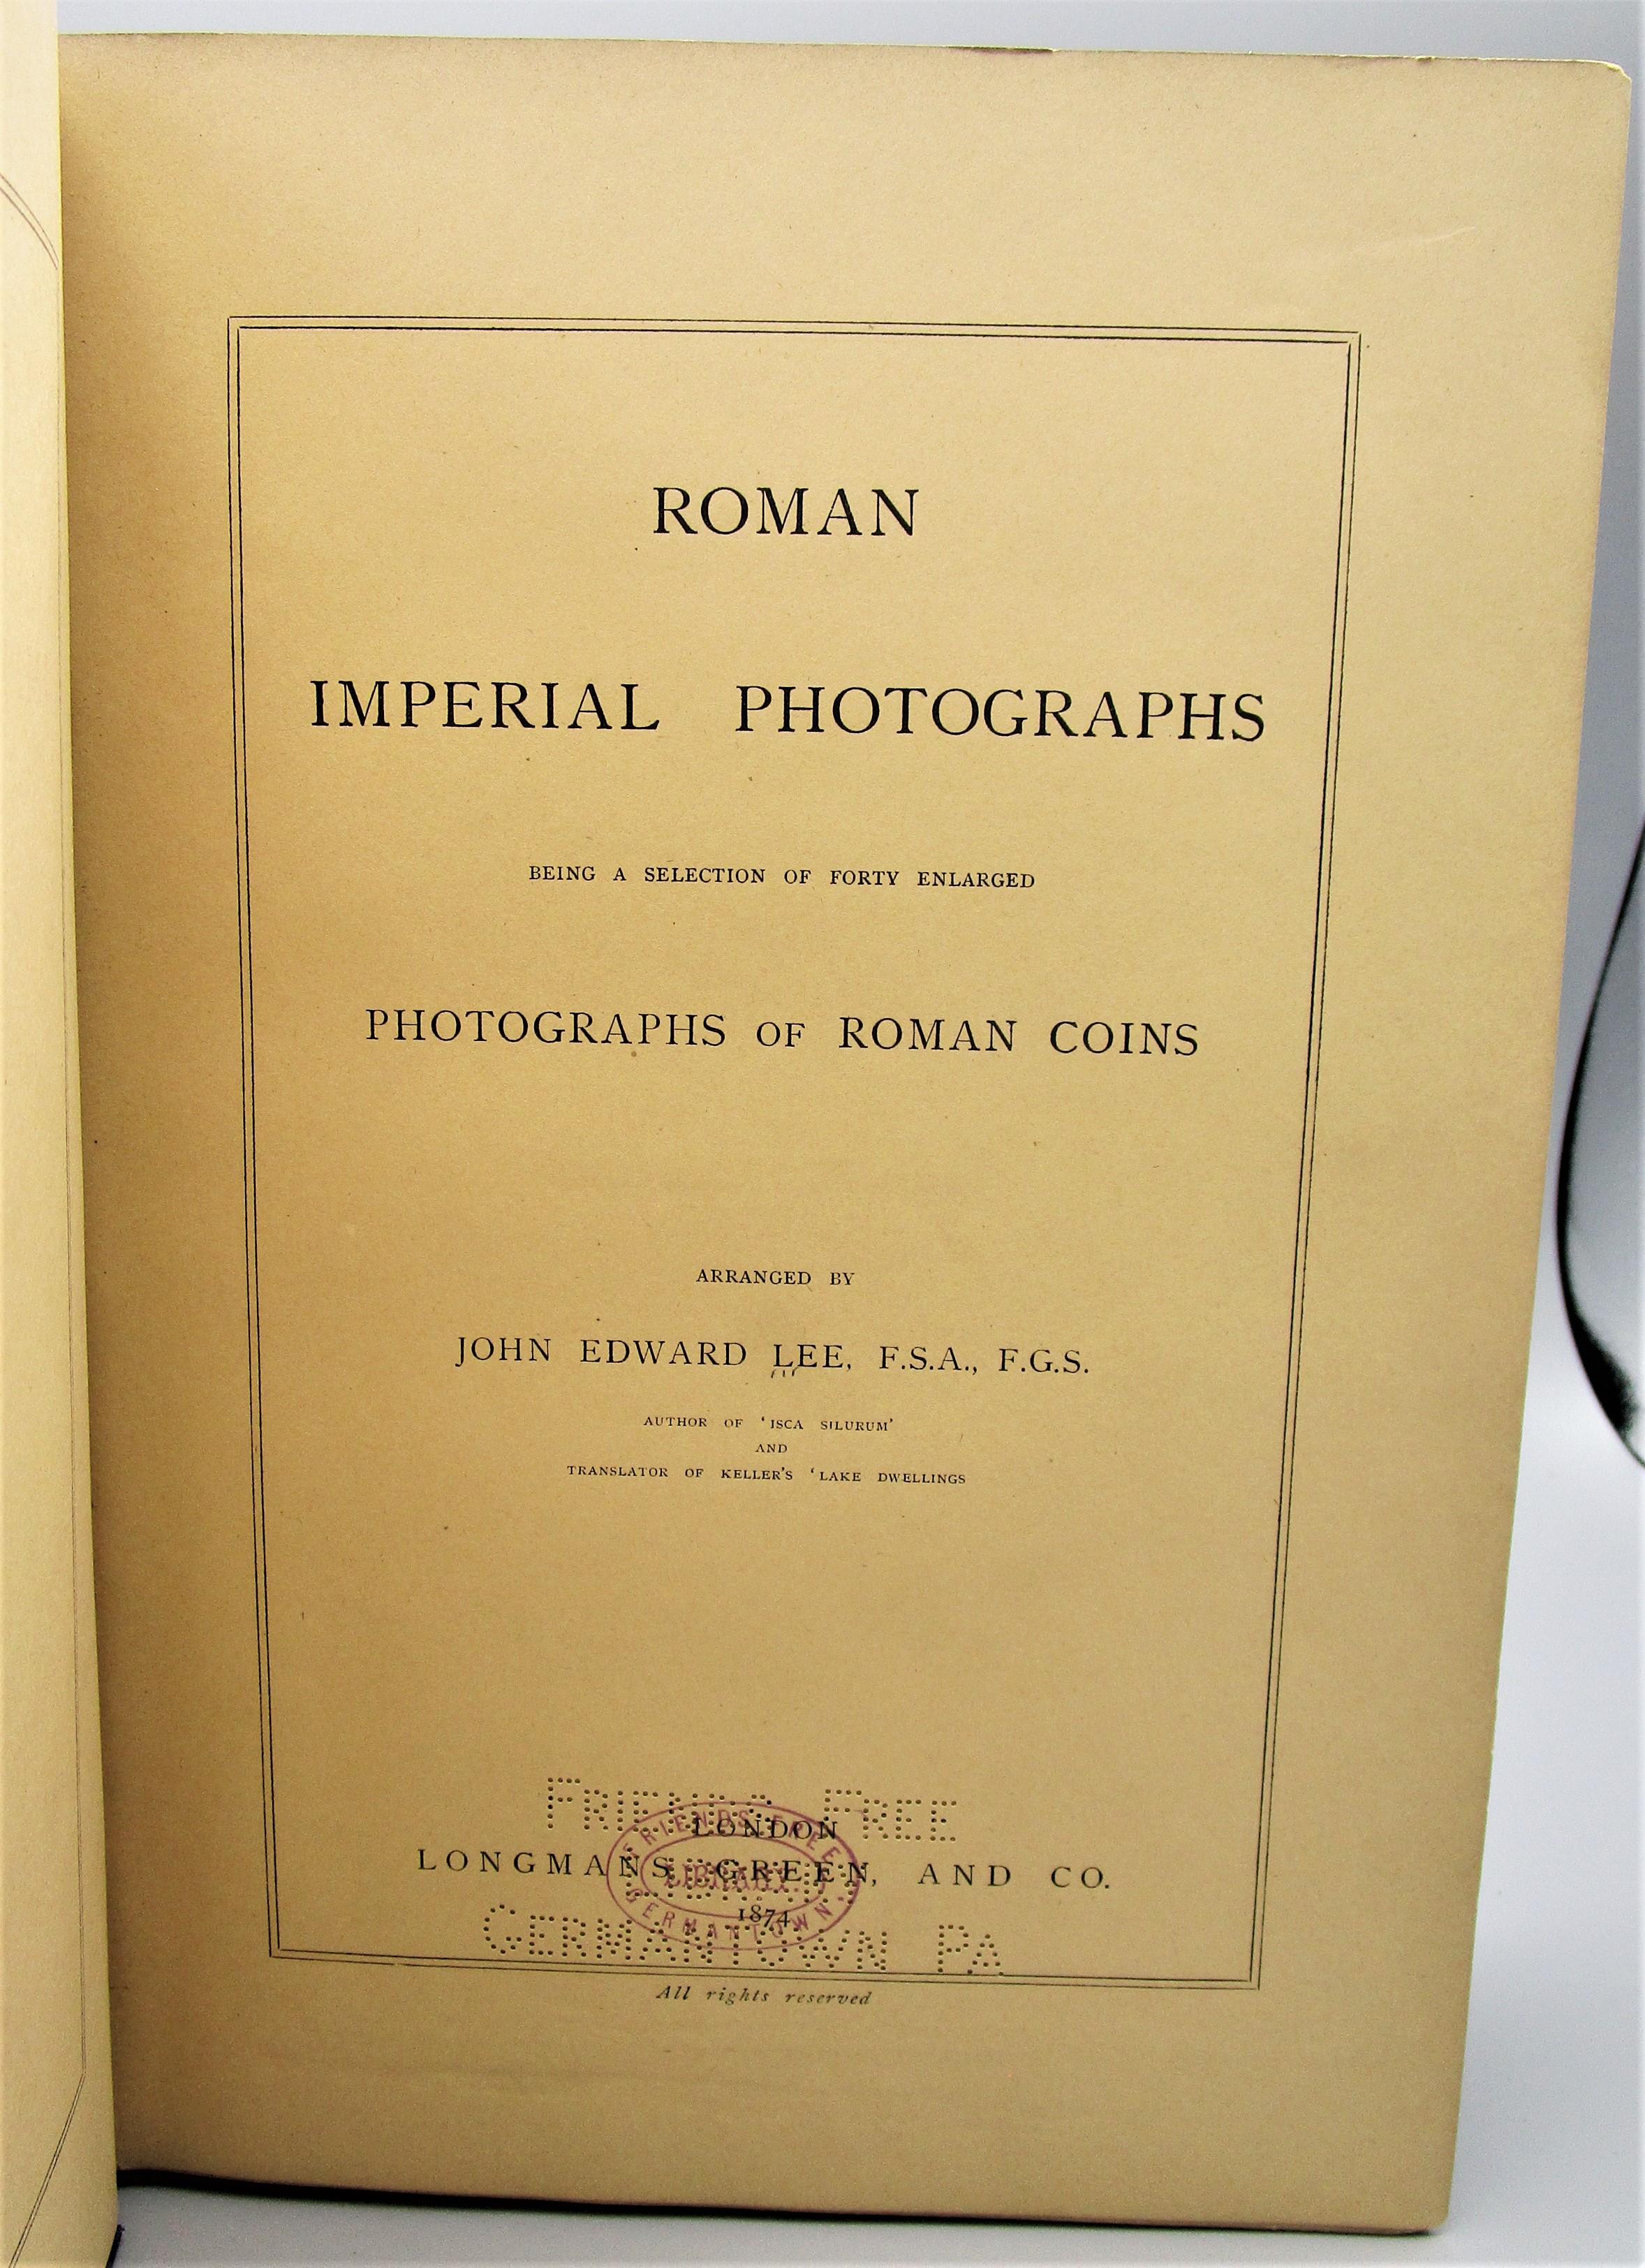 ROMAN IMPERIAL PHOTOGRAPHS, by John Edward Lee - 1874 [1st Ltd Ed]